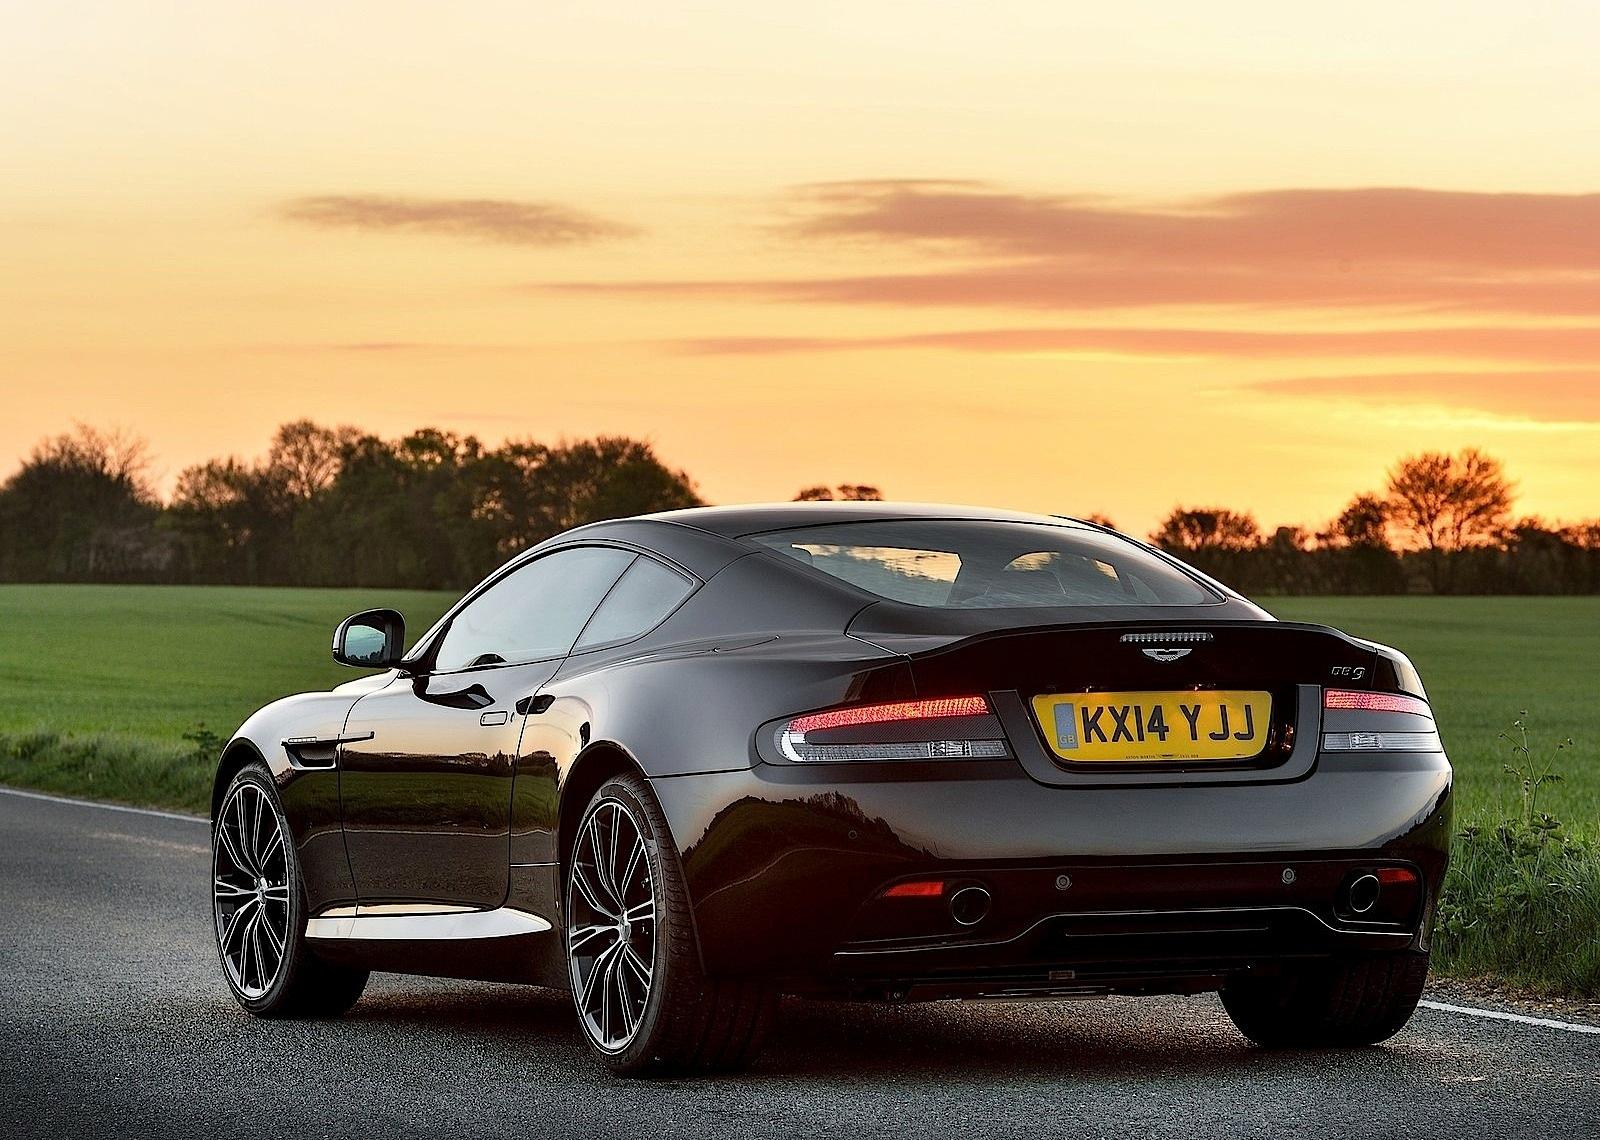 Aston Martin Db9 Carbon Edition Specs Amp Photos 2014